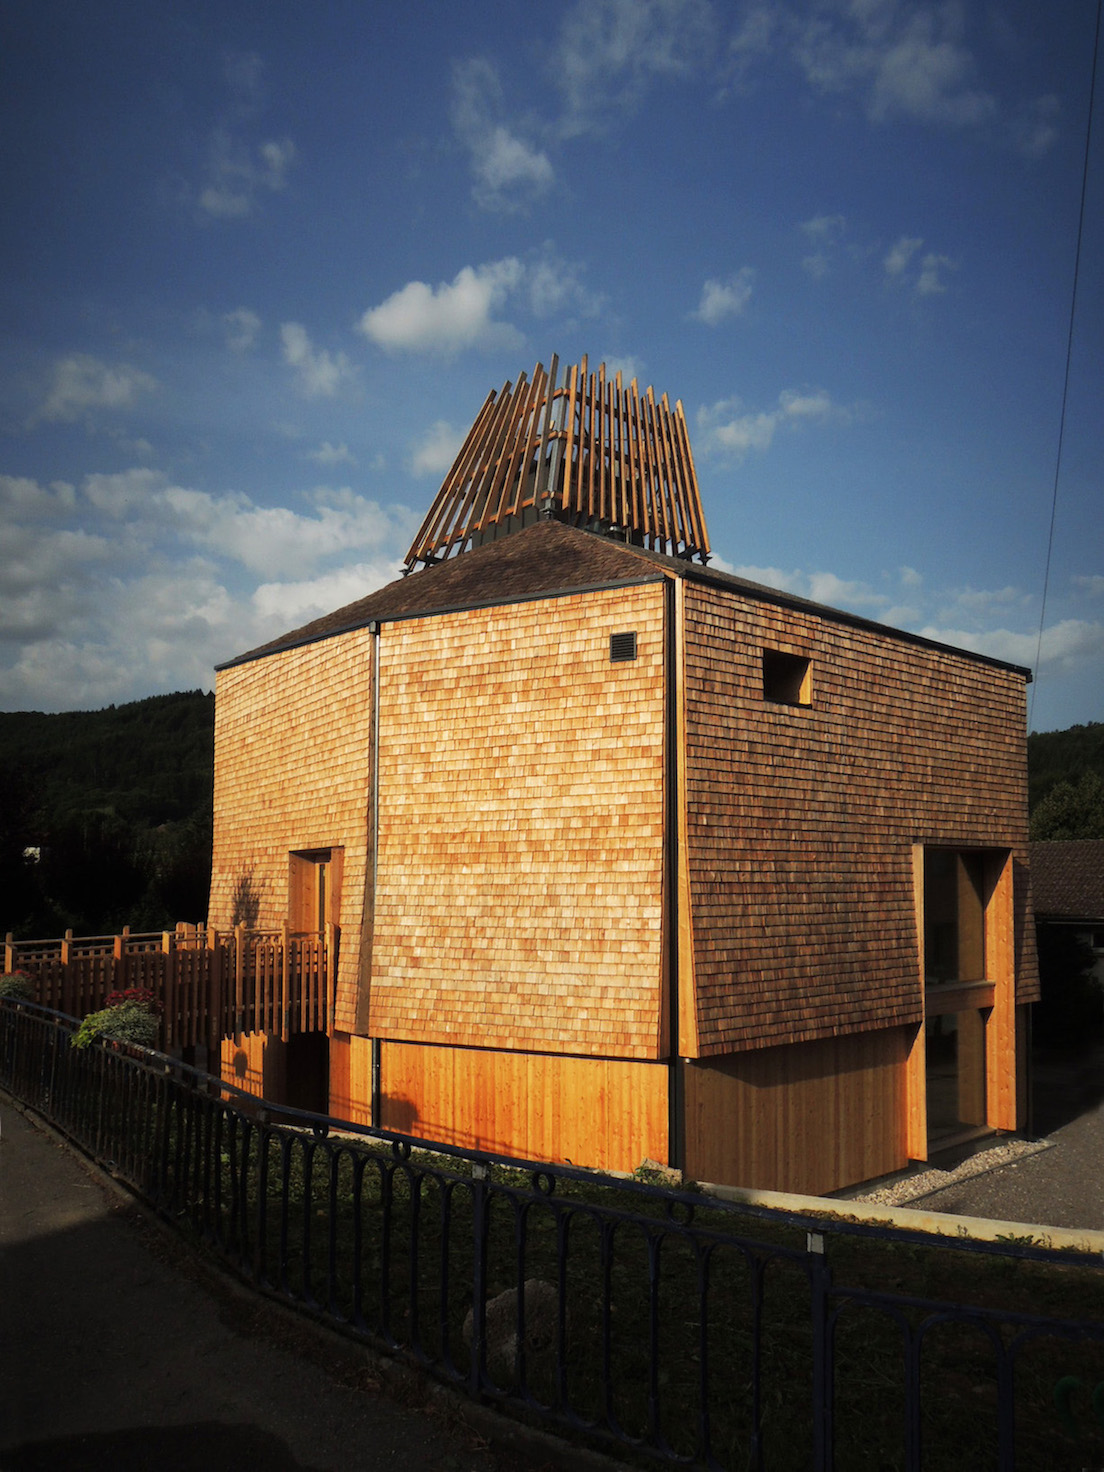 Haha architectures La ruche